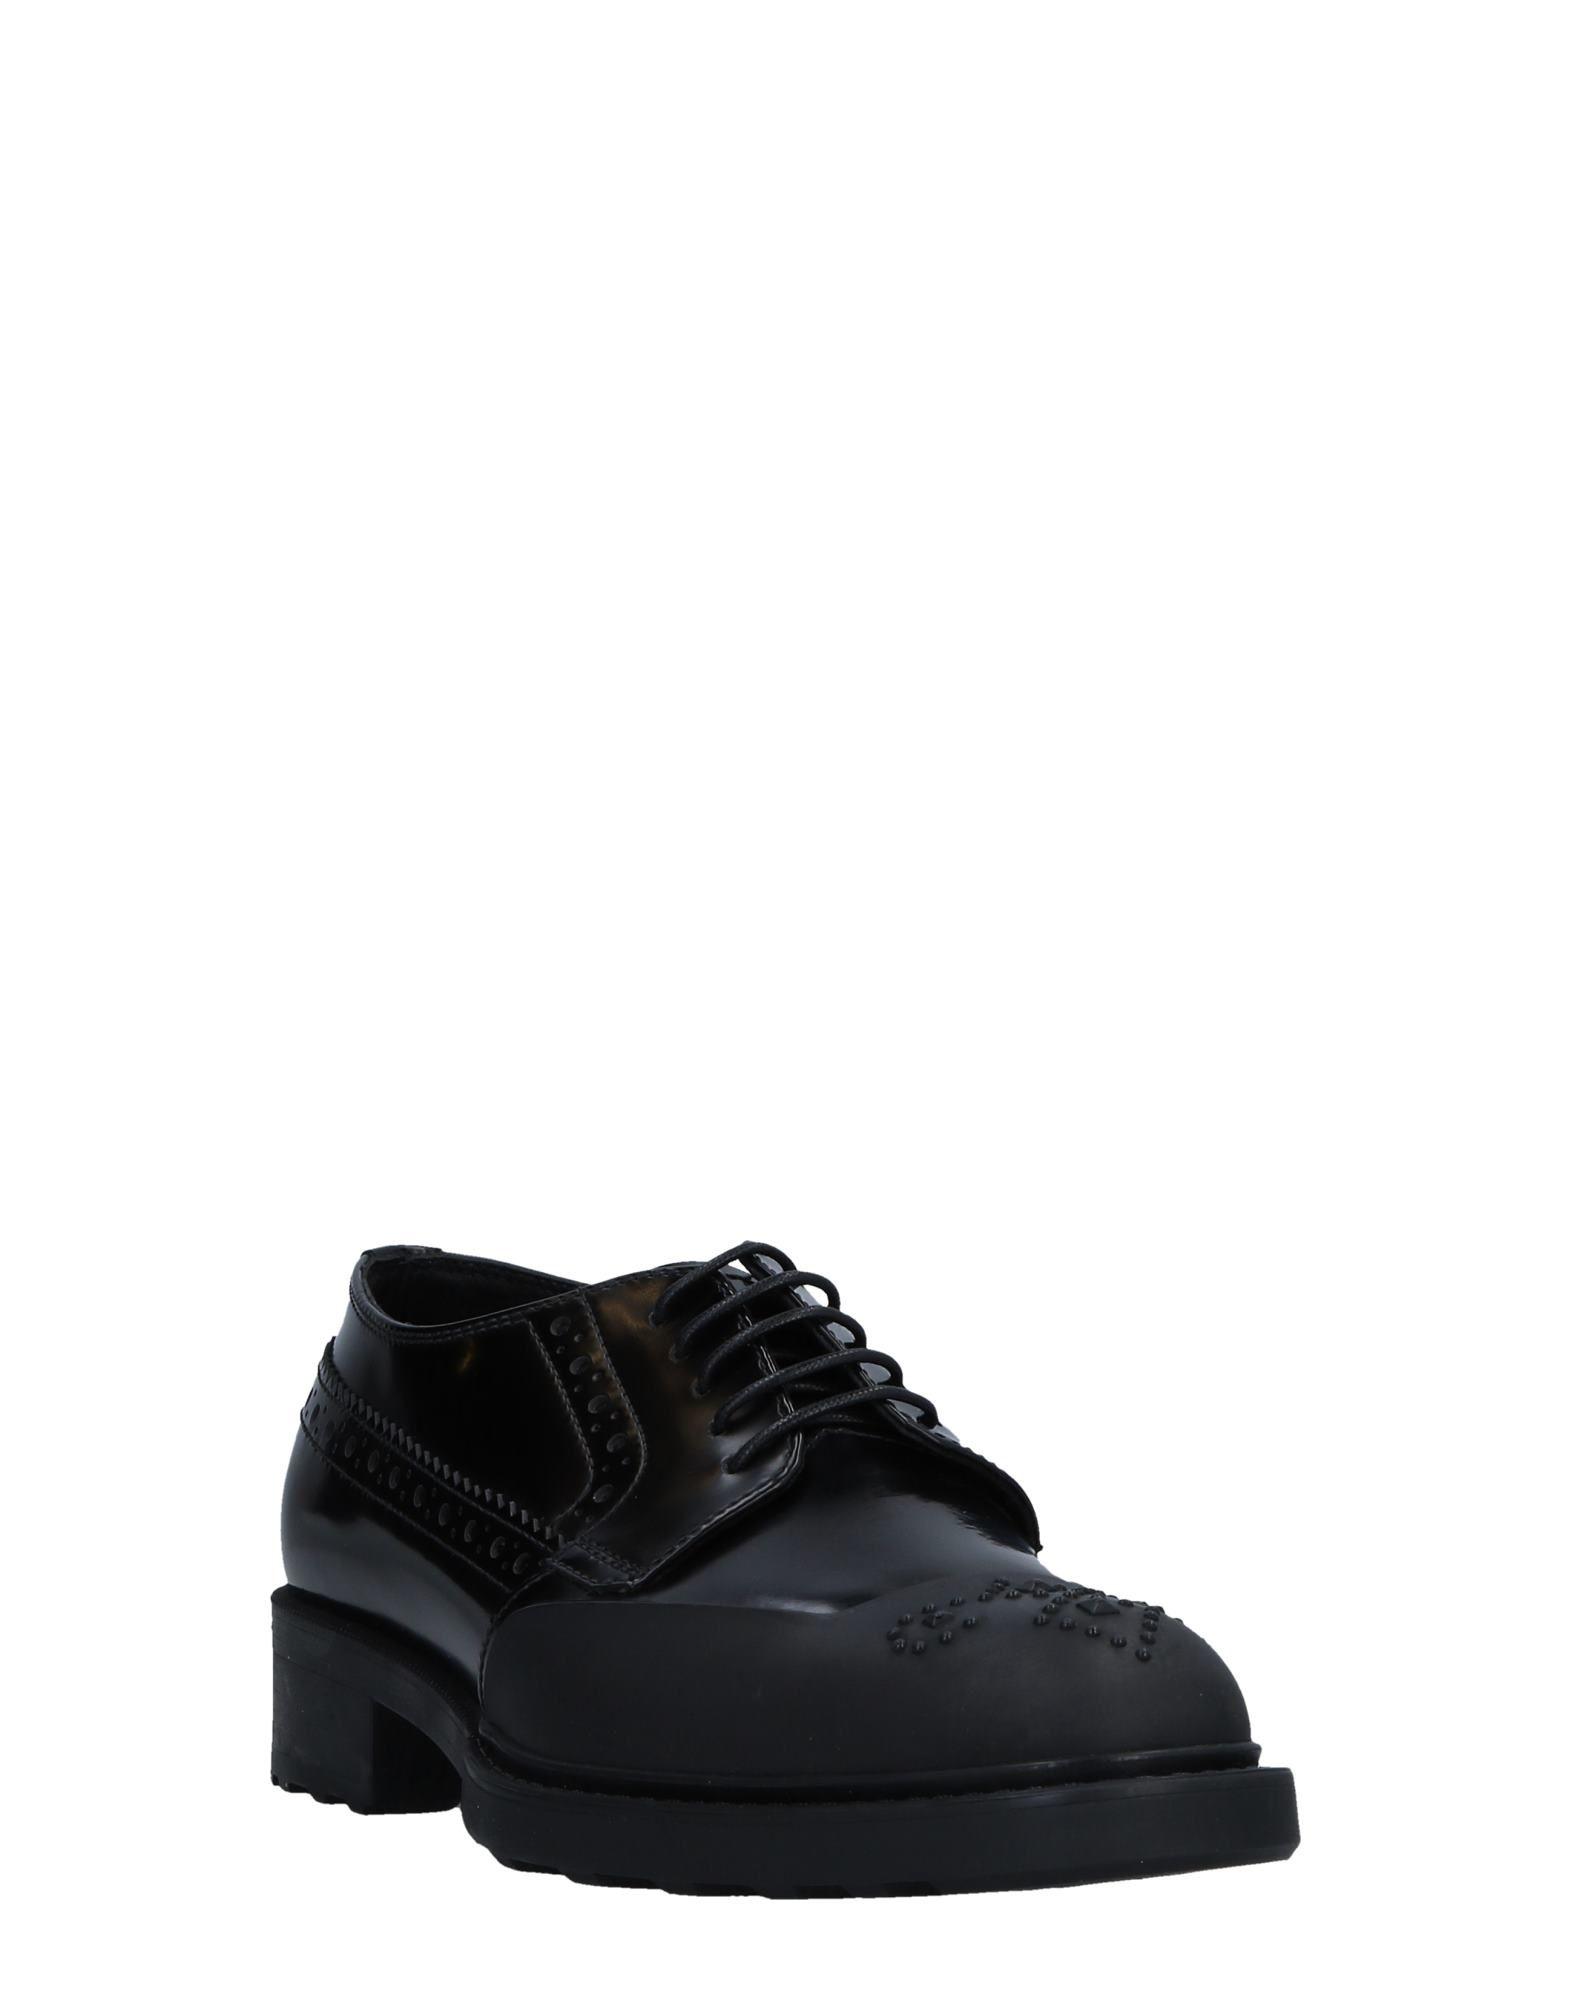 Barracuda Schnürschuhe Damen  11518340GBGut aussehende strapazierfähige Schuhe